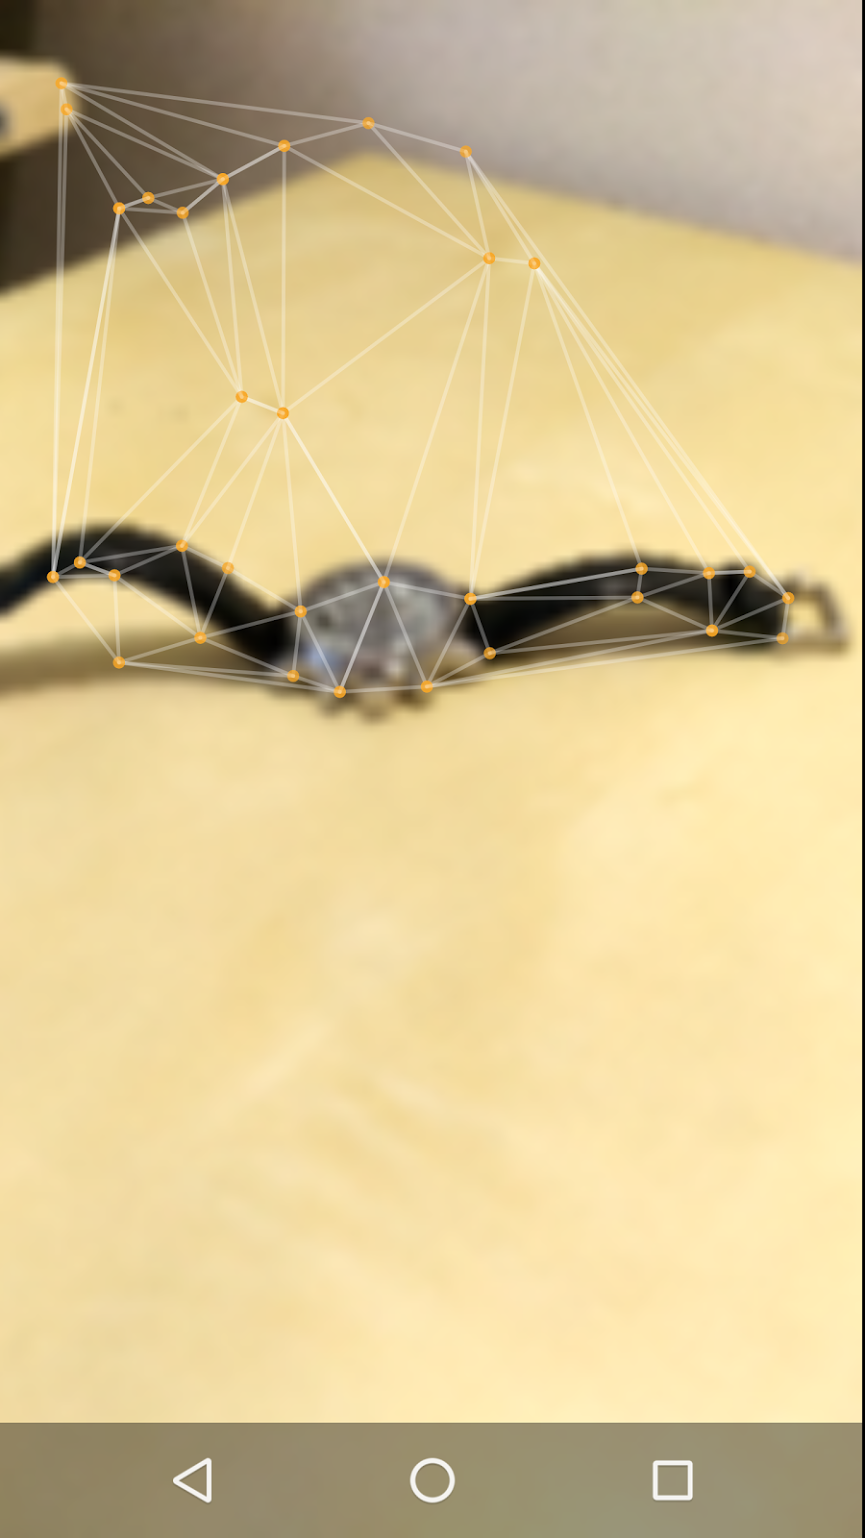 Обзор Alcatel IDOL 4S: виртуальная реальность из коробки - 15